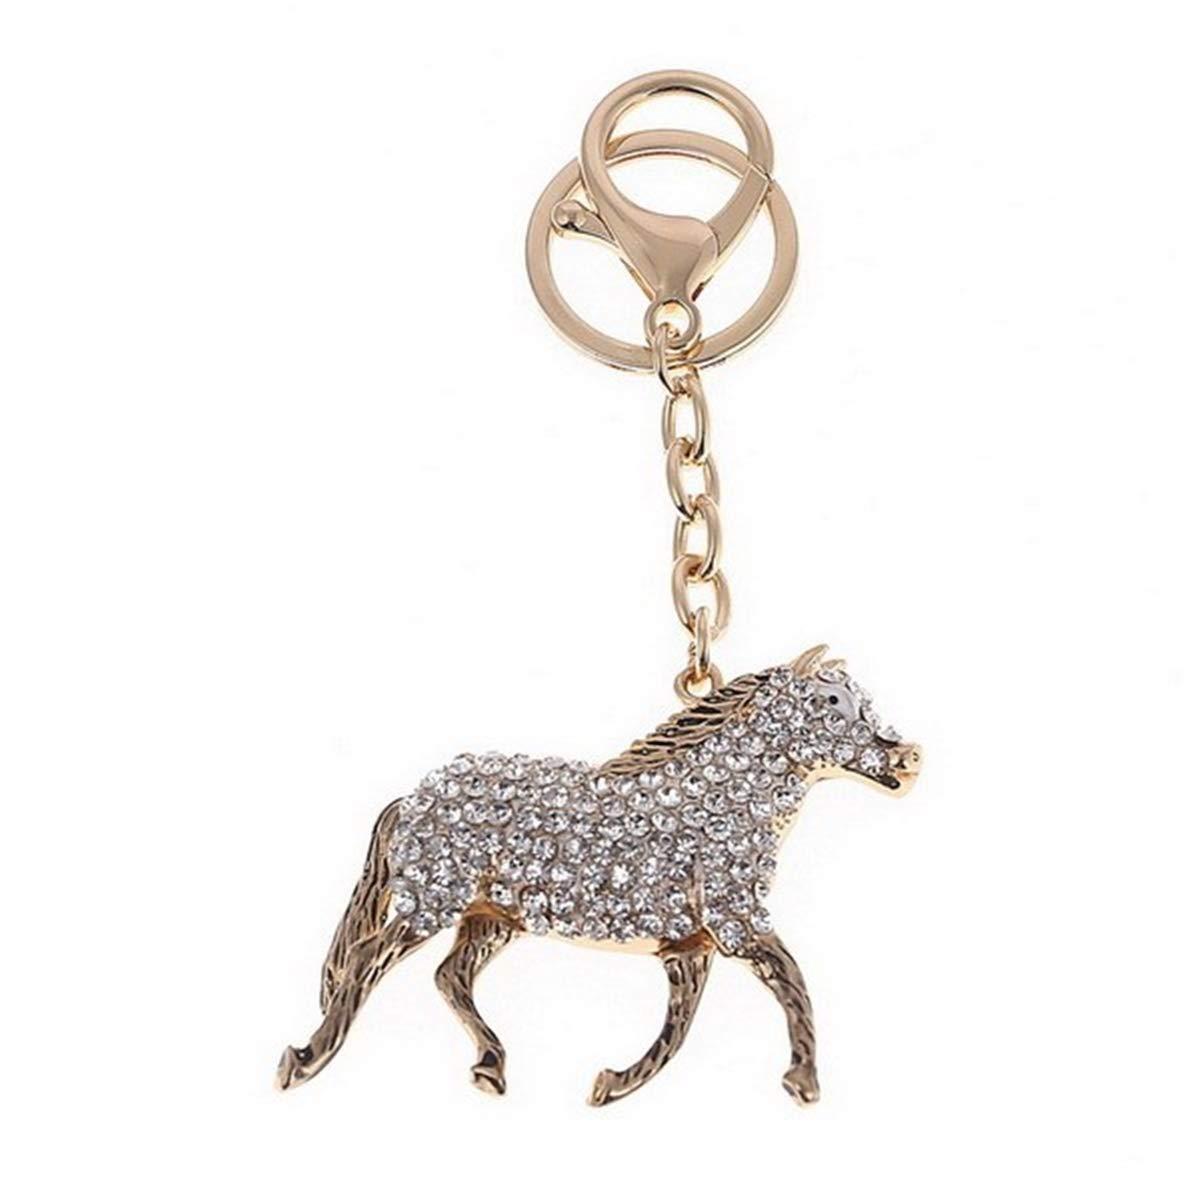 LeahWard Women's Elephant Diamante Rhinestone Bag Charm Handbag Keyring Crystal Keychain 302 (Chicken)